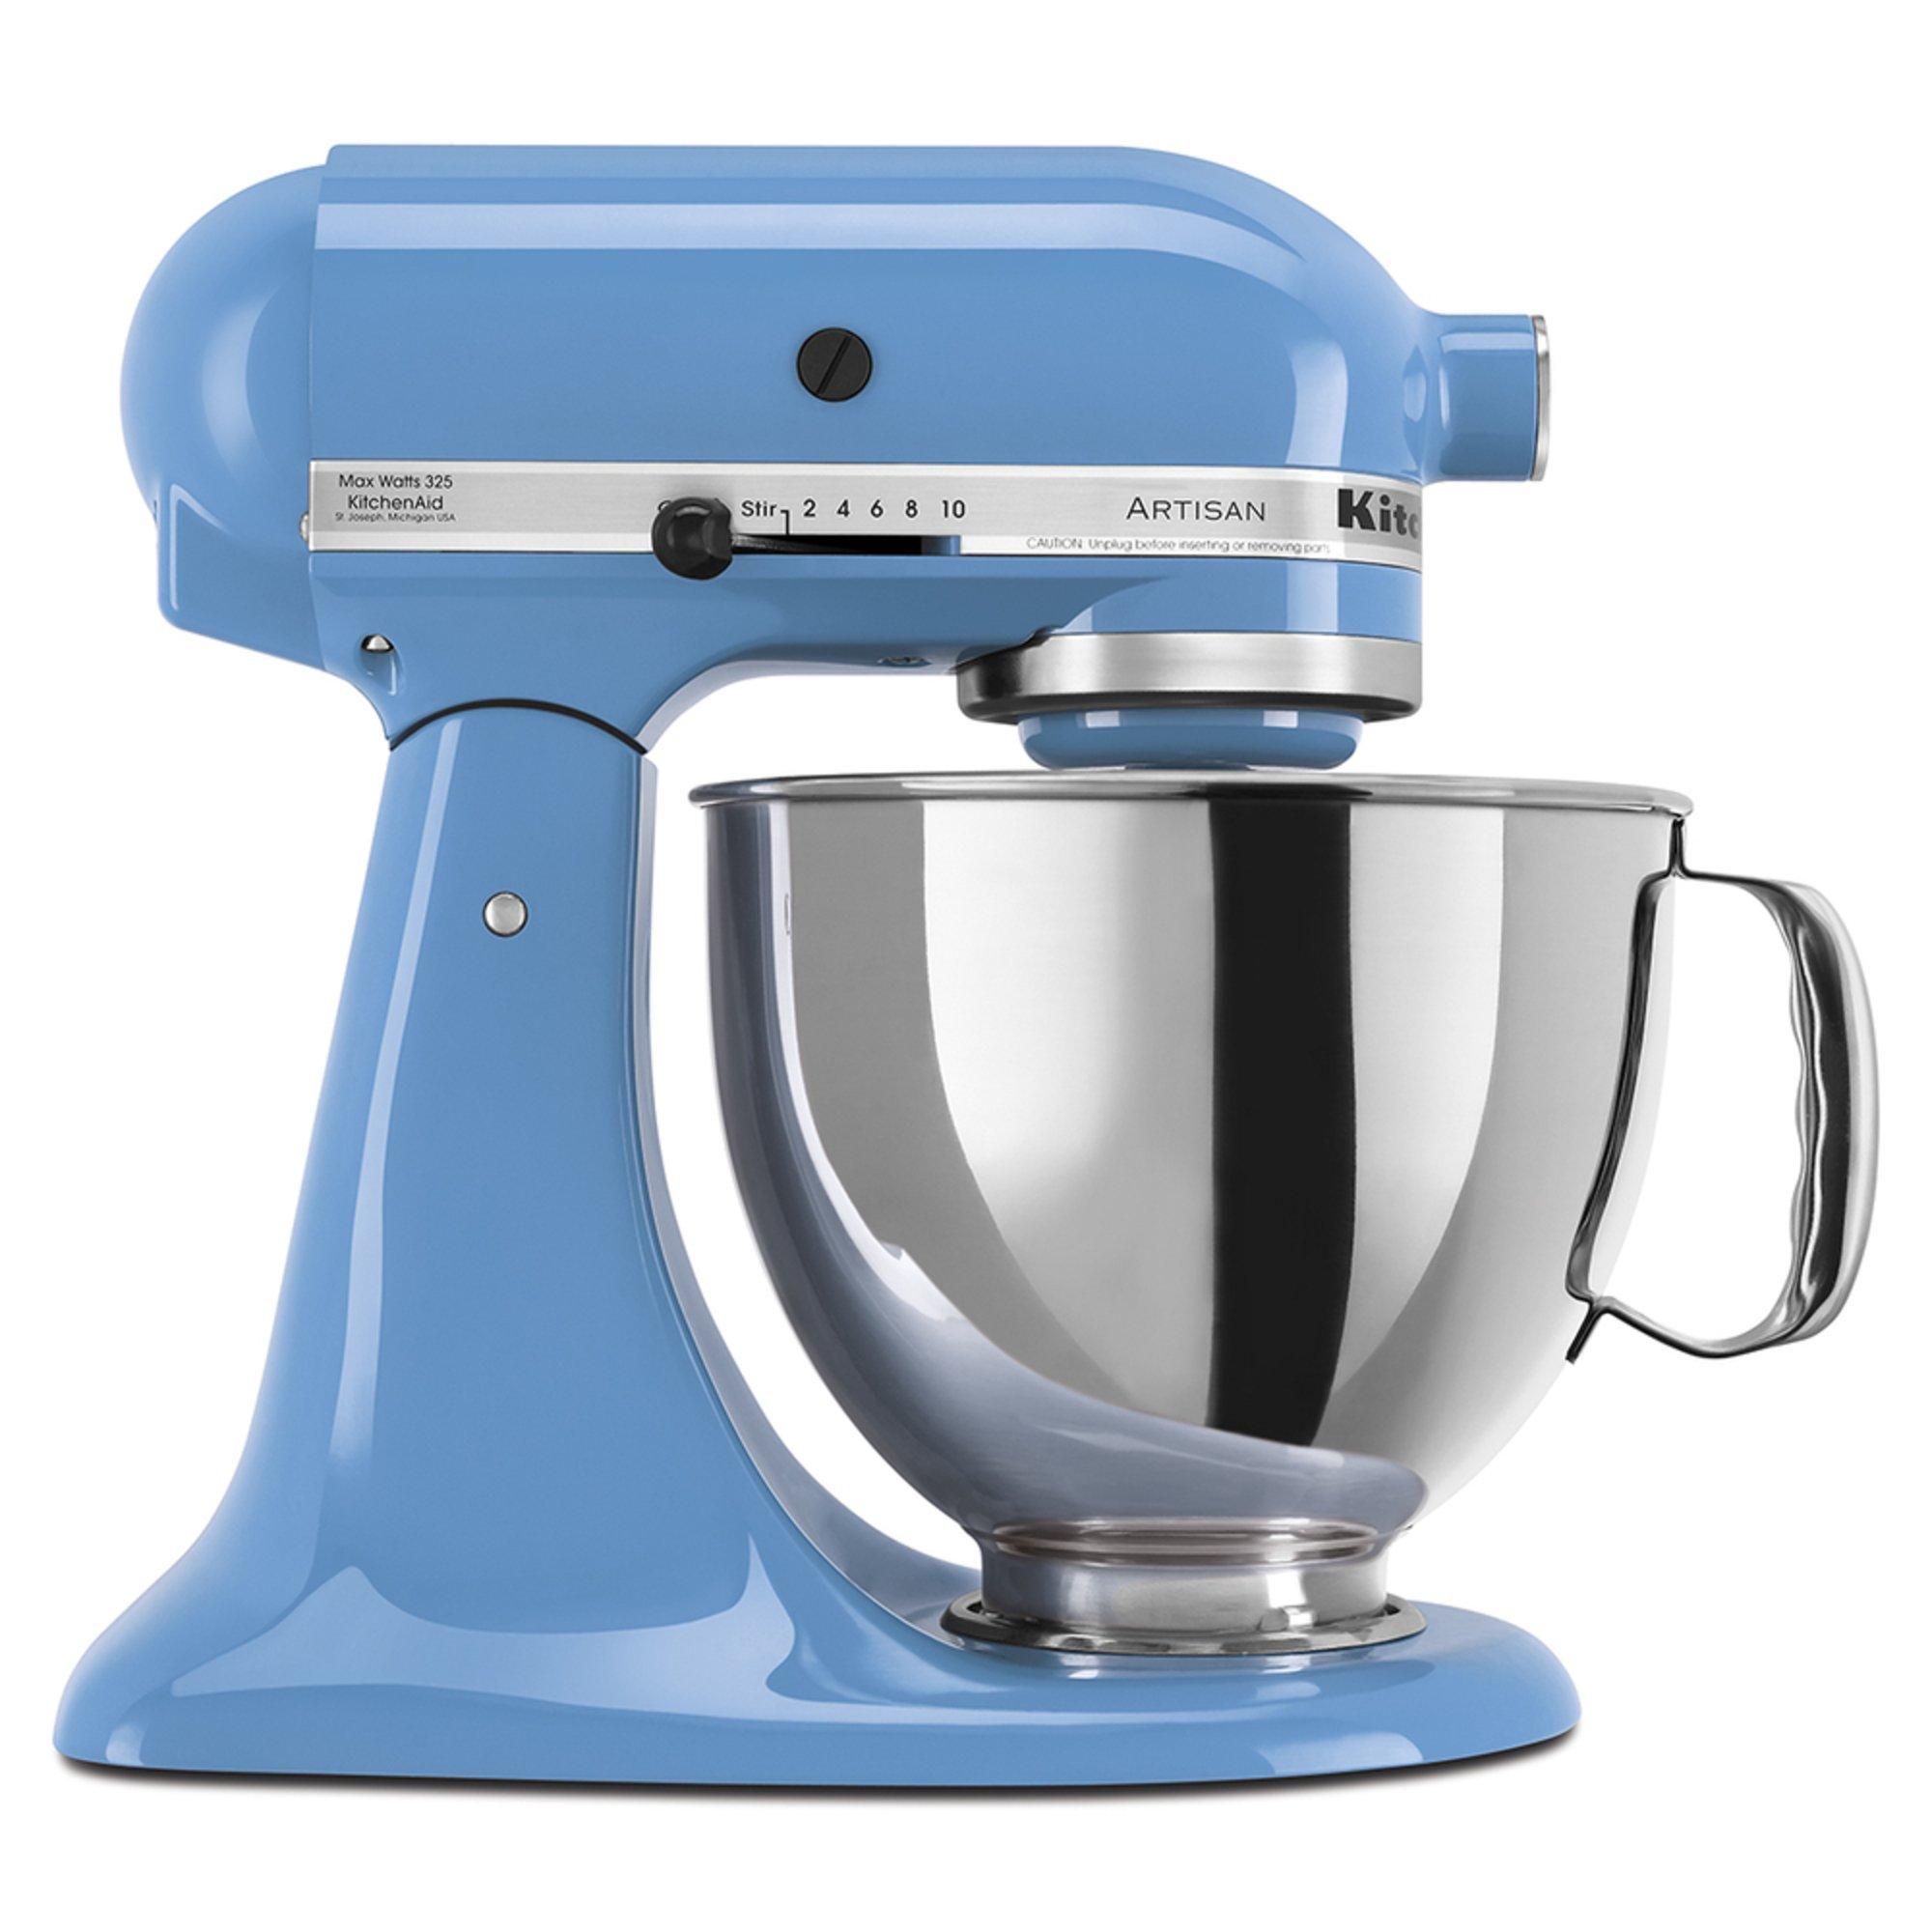 Kitchenaid artisan series 5 quart tilt head stand mixer cornflower blue ksm150psco stand - Kitchenaid artisan qt stand mixer sale ...